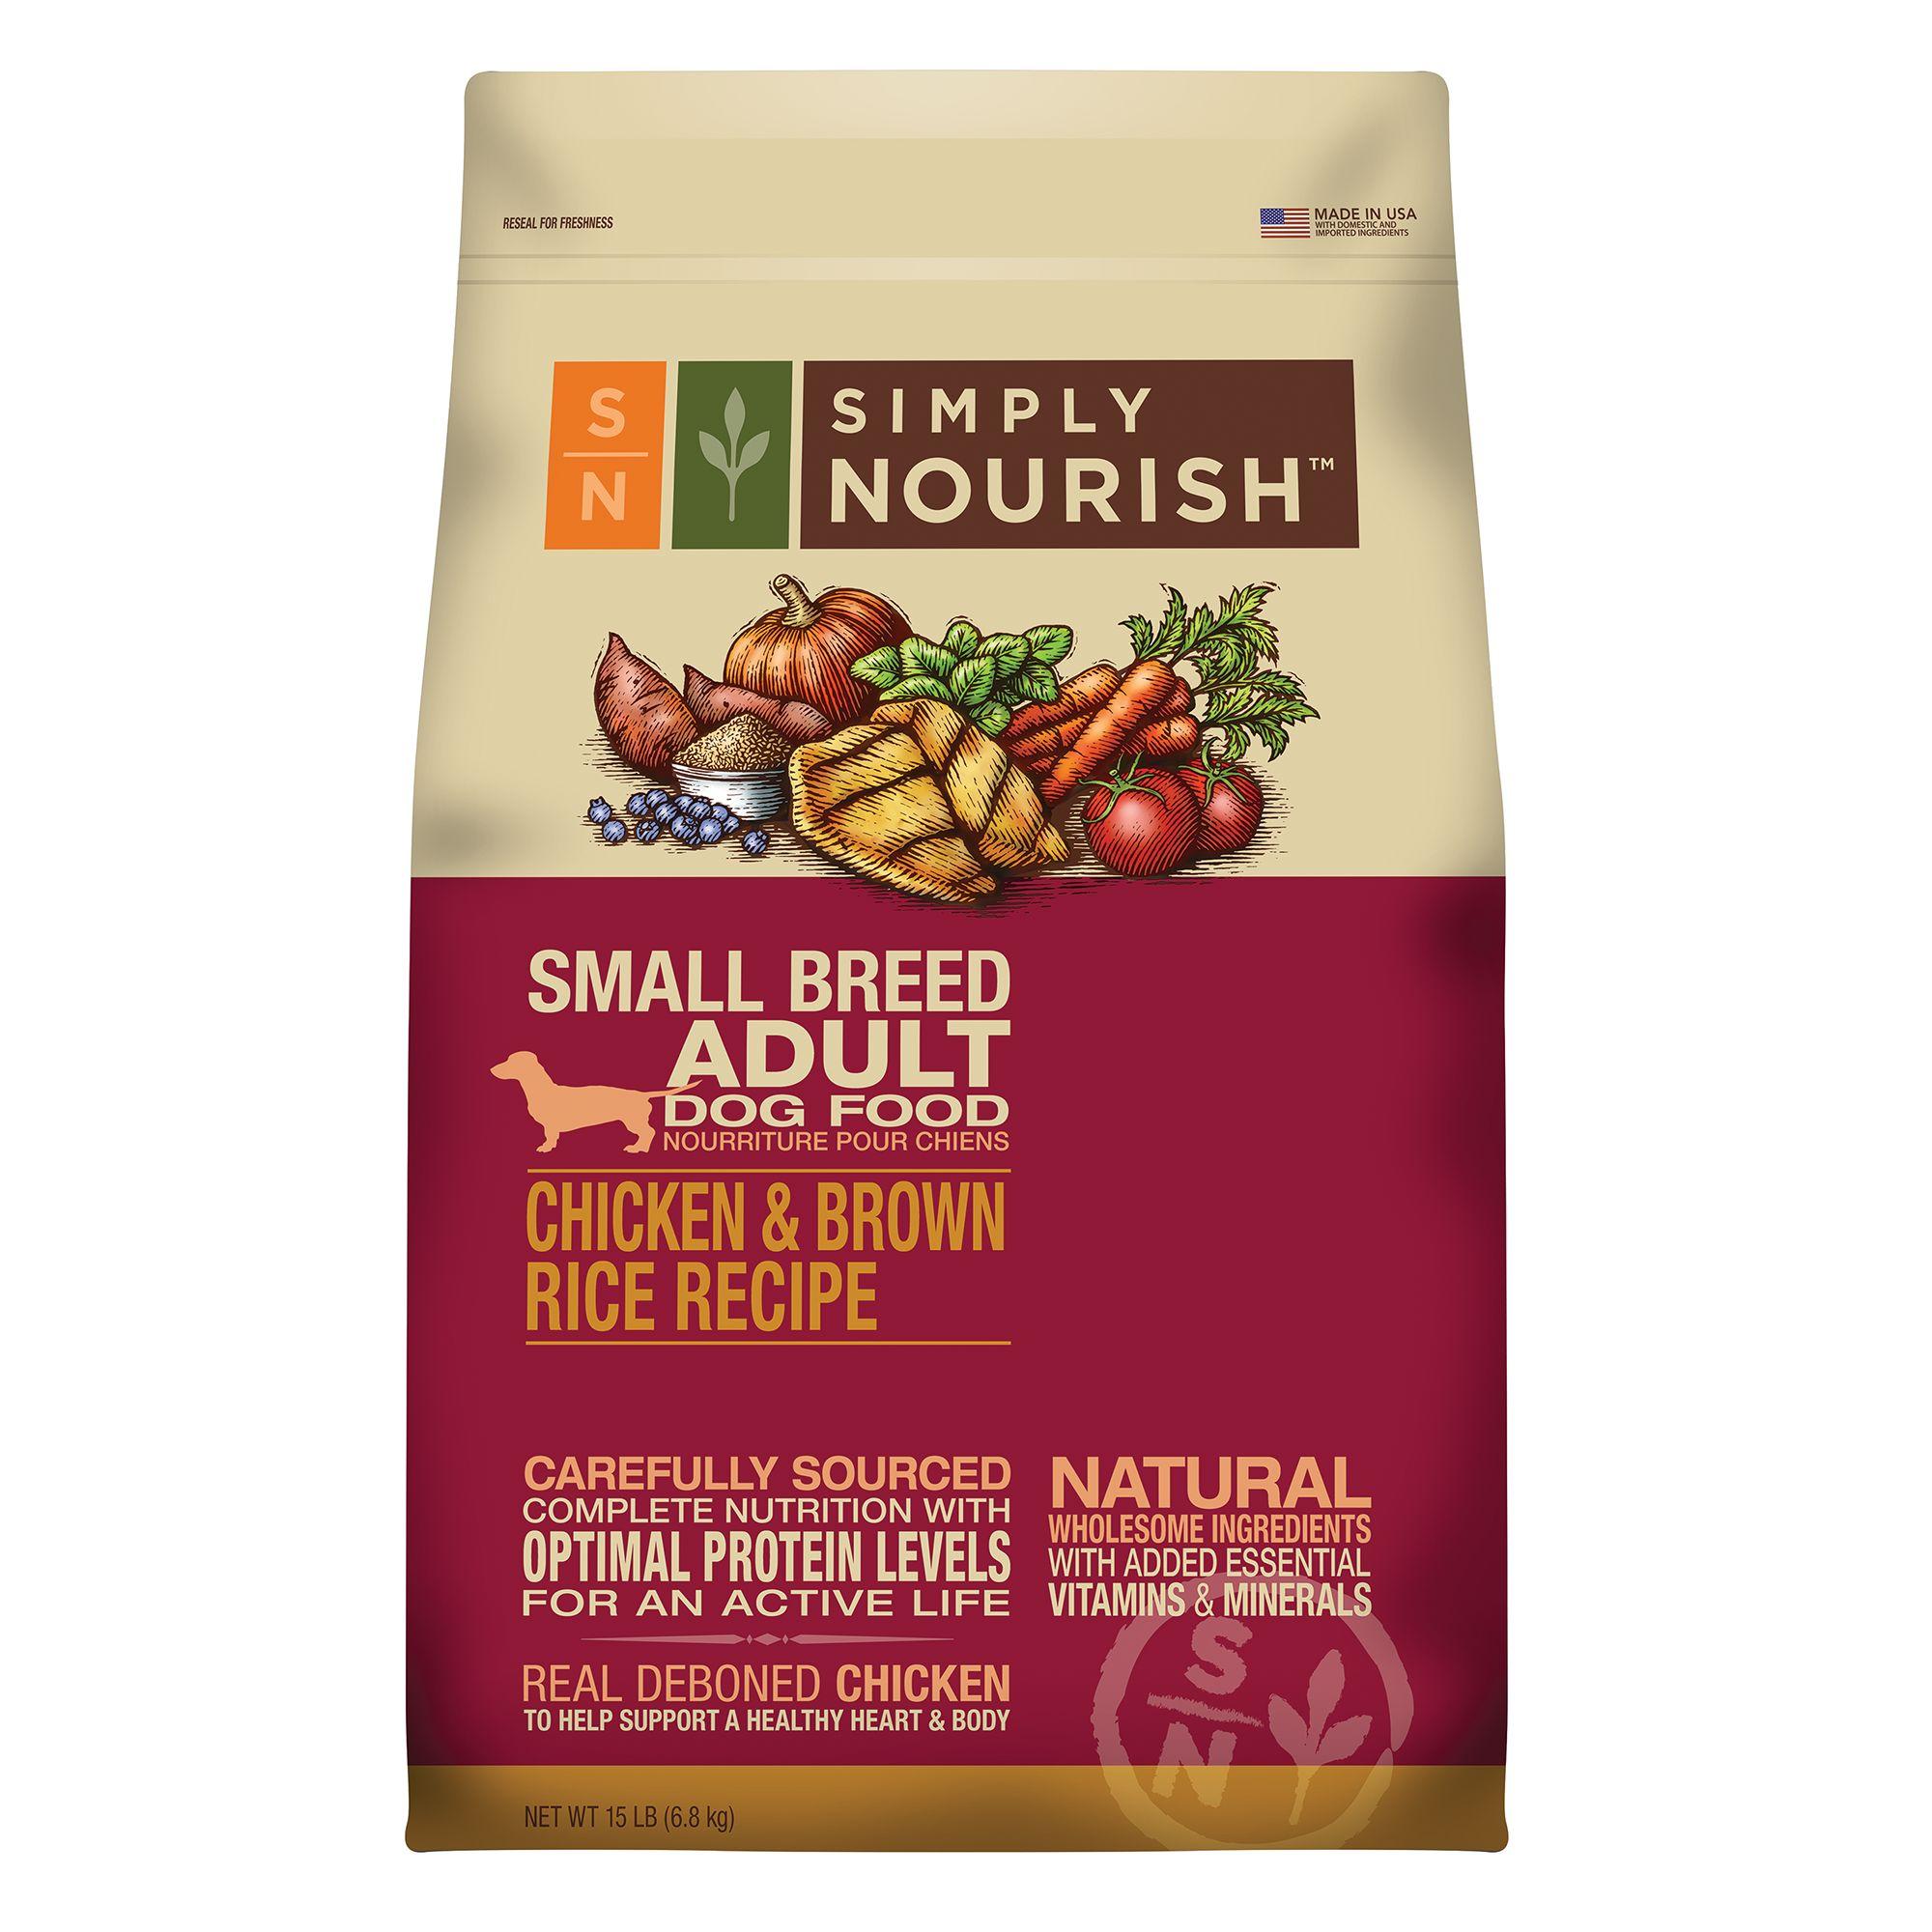 737257428867 UPC - Small Breed Adult Dog Food / Chicken & | UPC Lookup